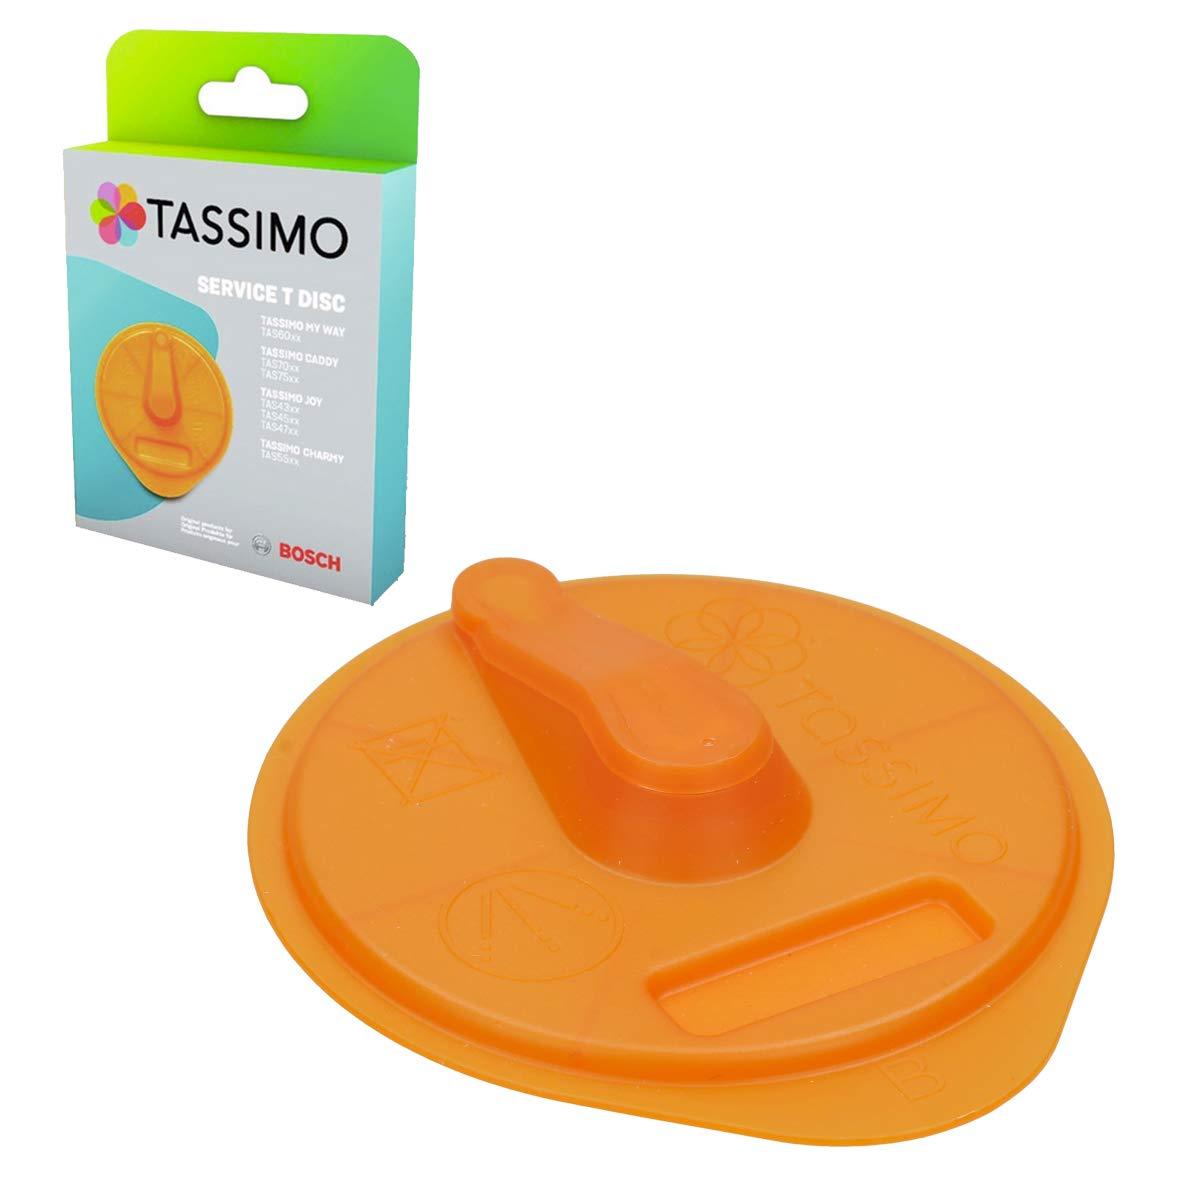 Bosch T-Disc Tassimo-Maschine Orange